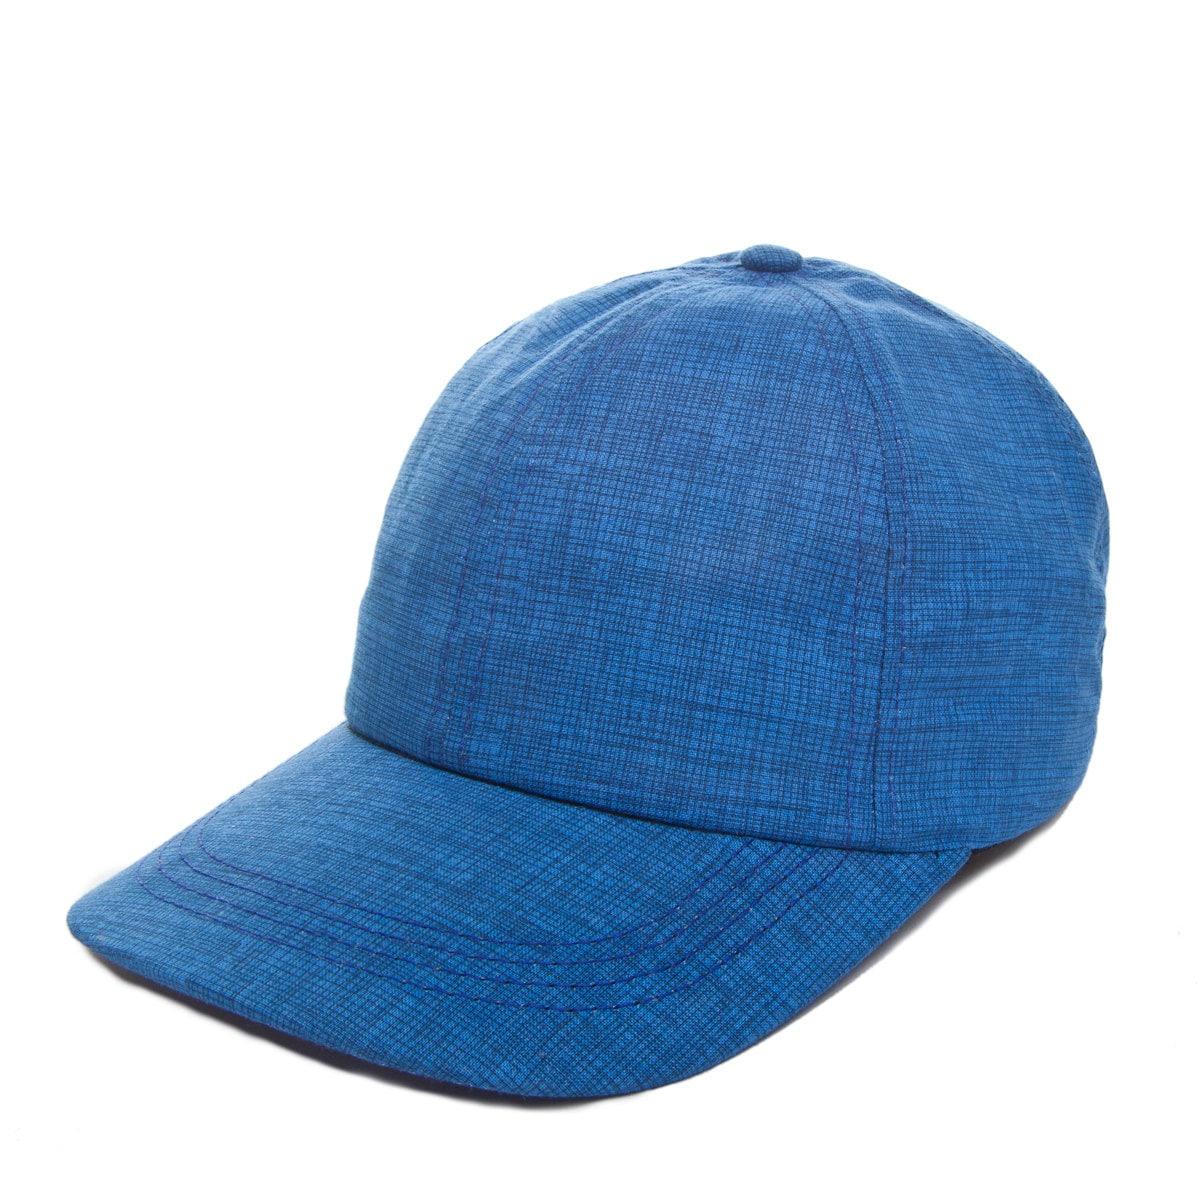 baseball cap for women cotton baseball cap blue cute by